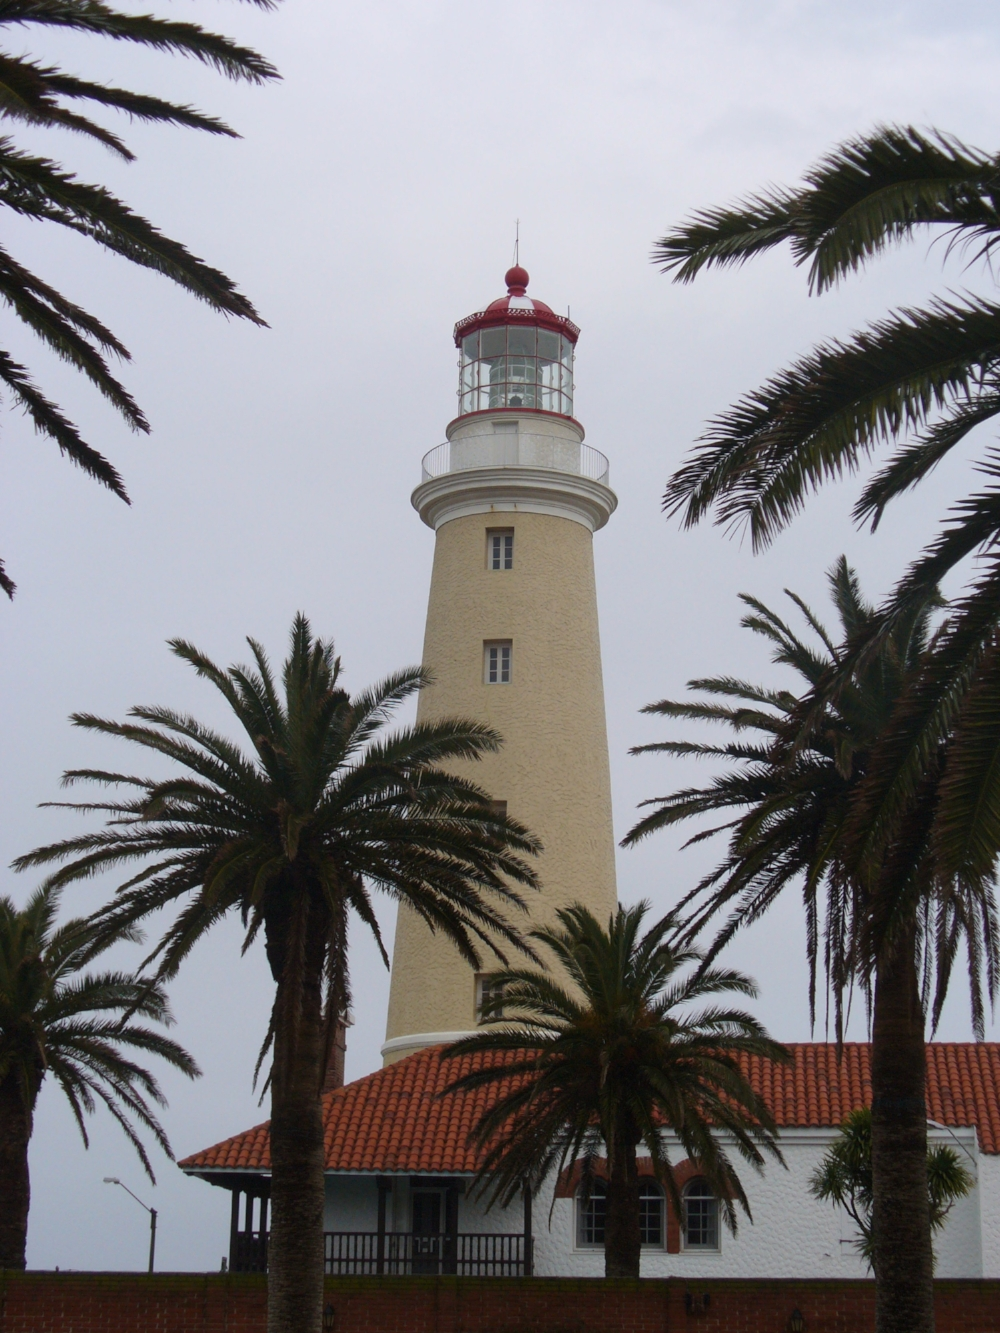 Faro Punta del Este - Uruguay